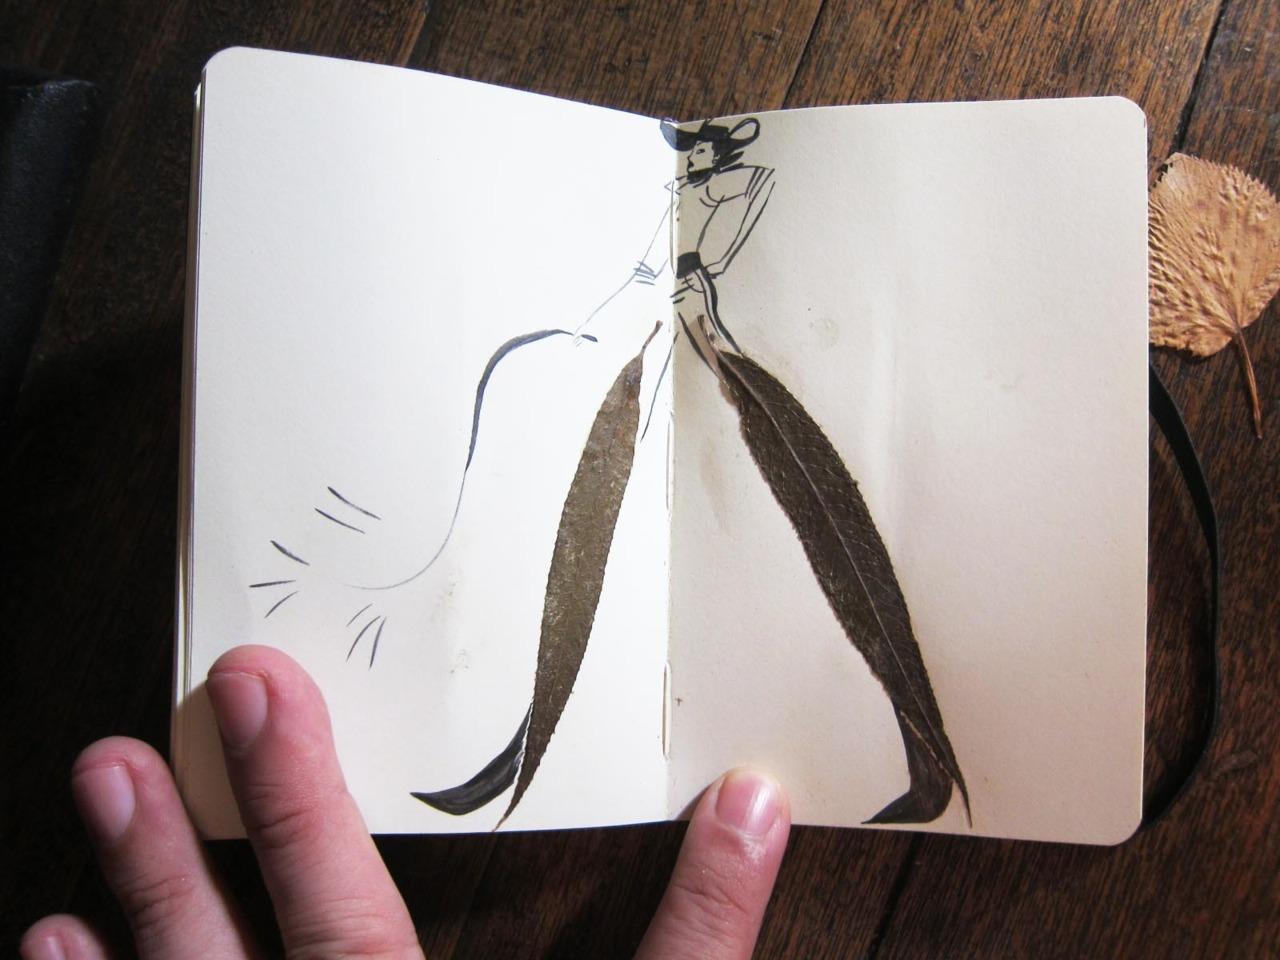 herbier feuille illustration 06 Un herbier illustré